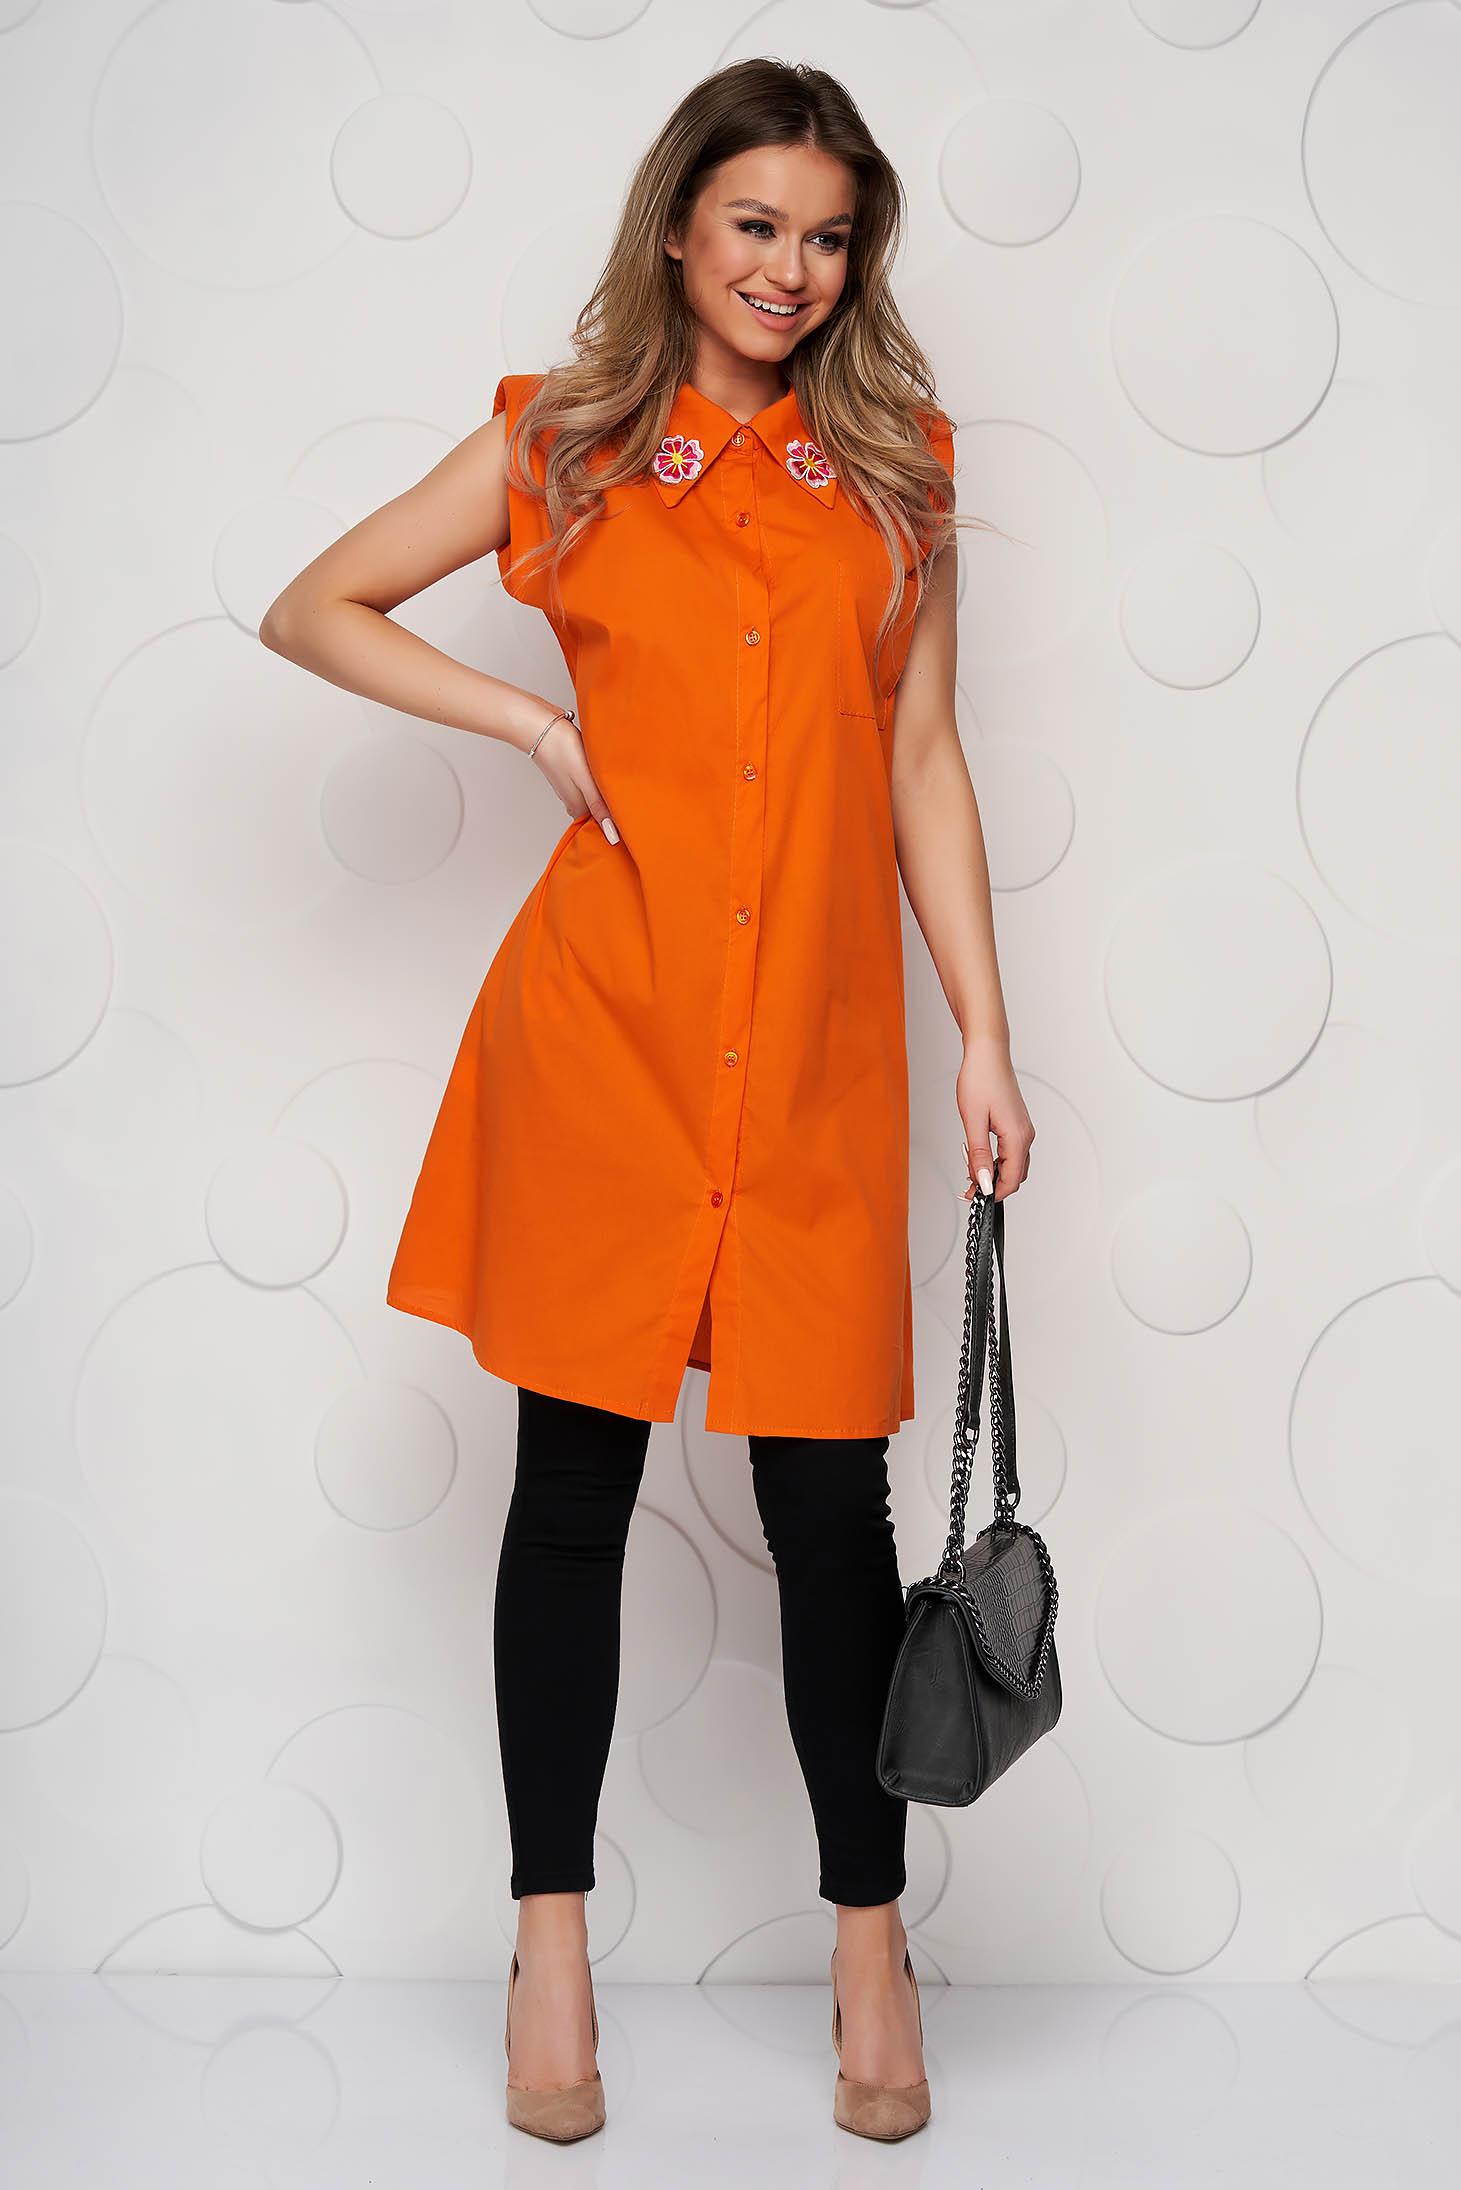 Orange women`s shirt poplin, thin cotton short sleeve loose fit embroidered